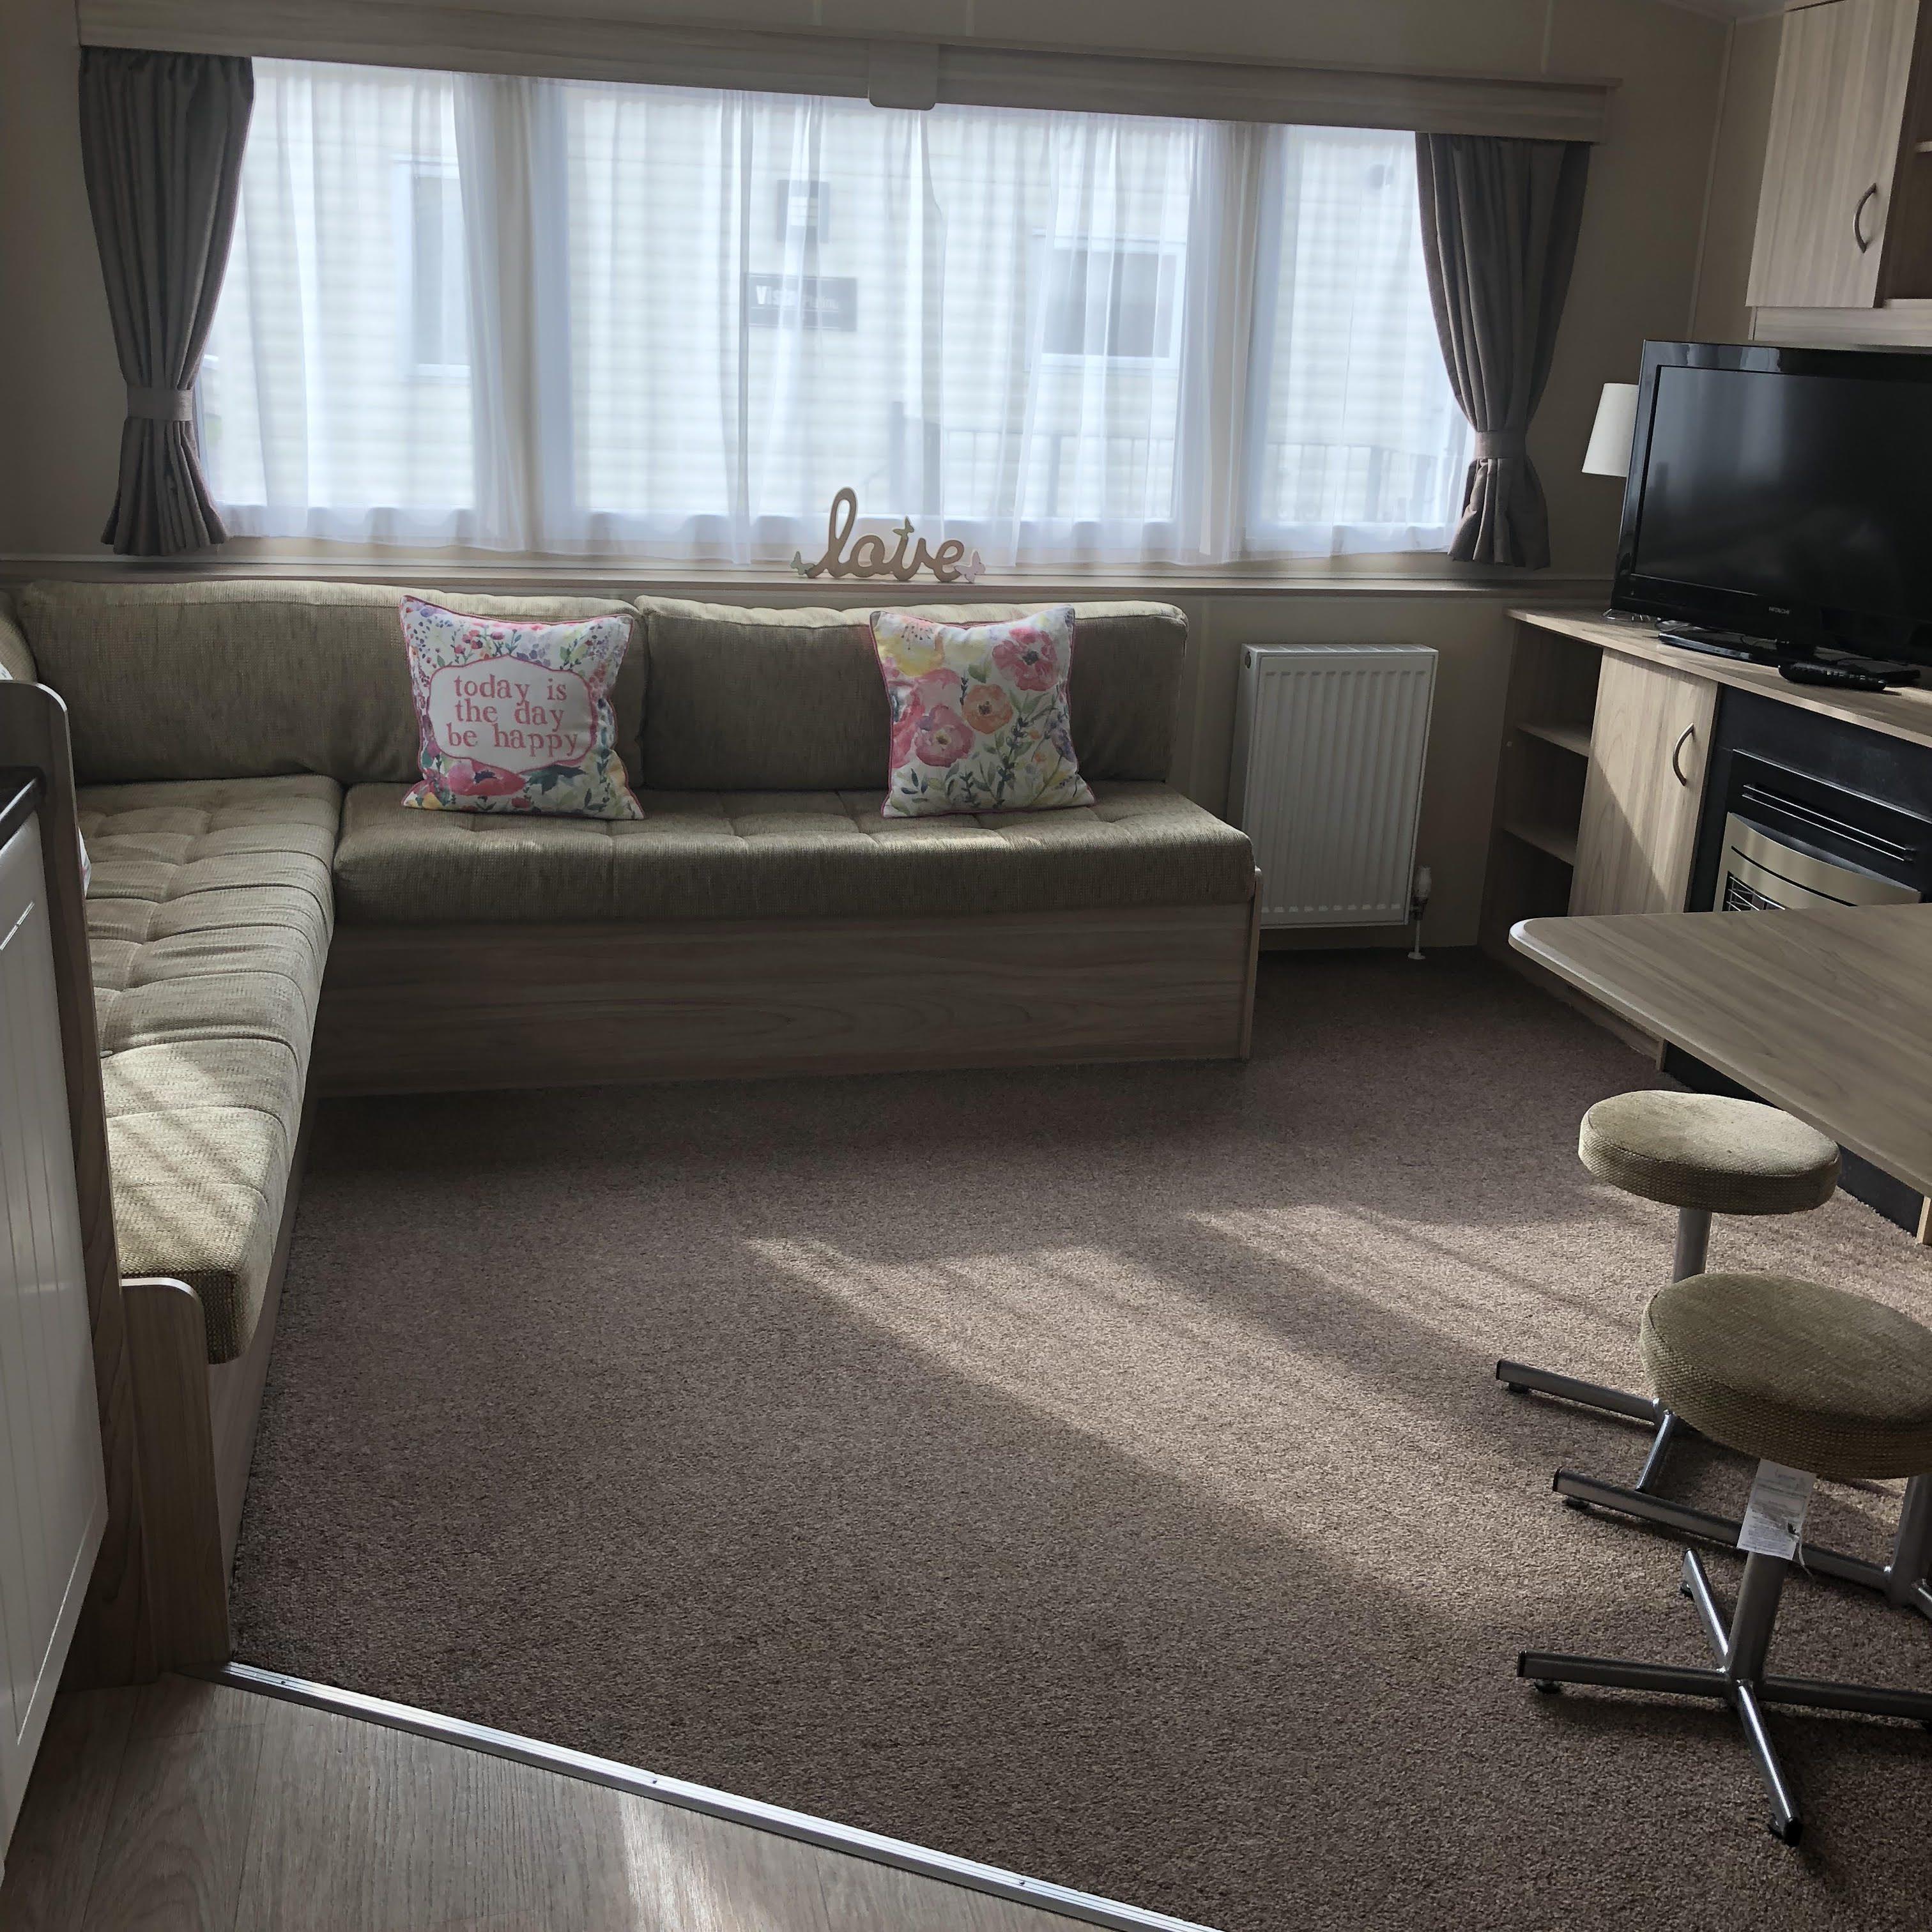 Gold 1 - Lounge